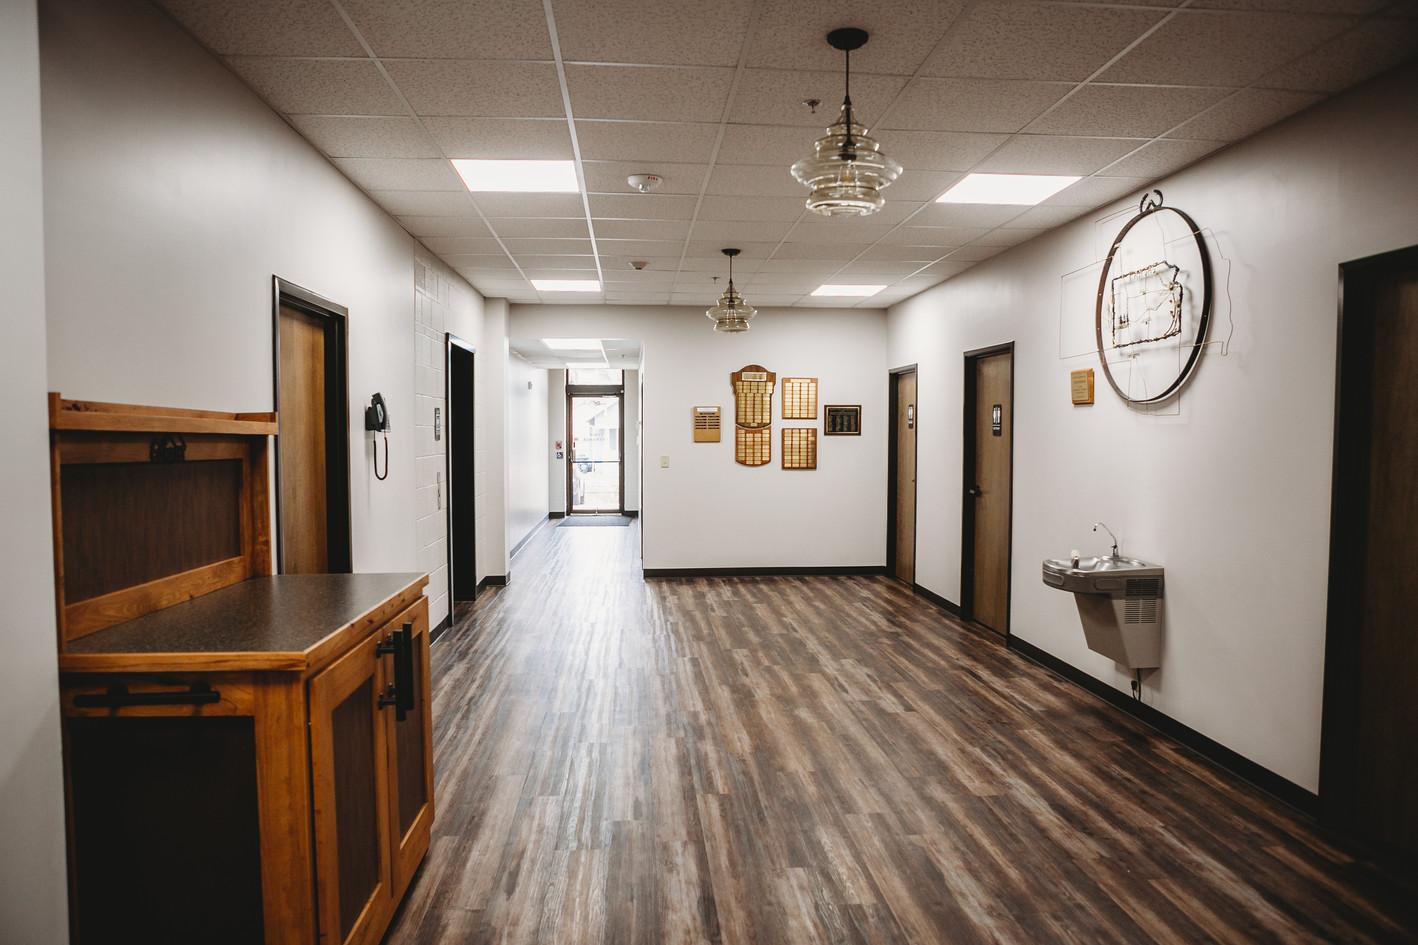 Dodge City Public Library: Public Lobby